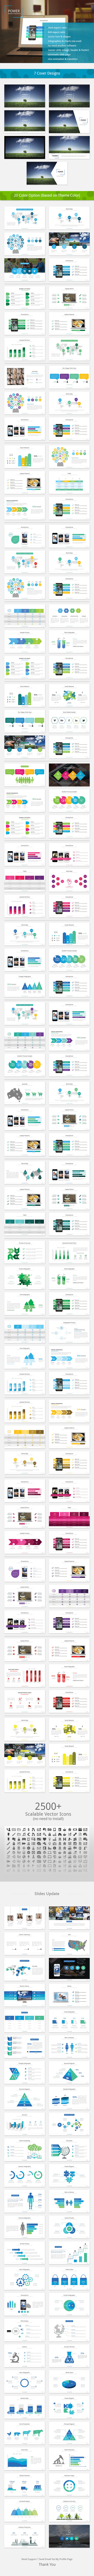 Power - Presentation Template (Vol. 4) - Business PowerPoint Templates